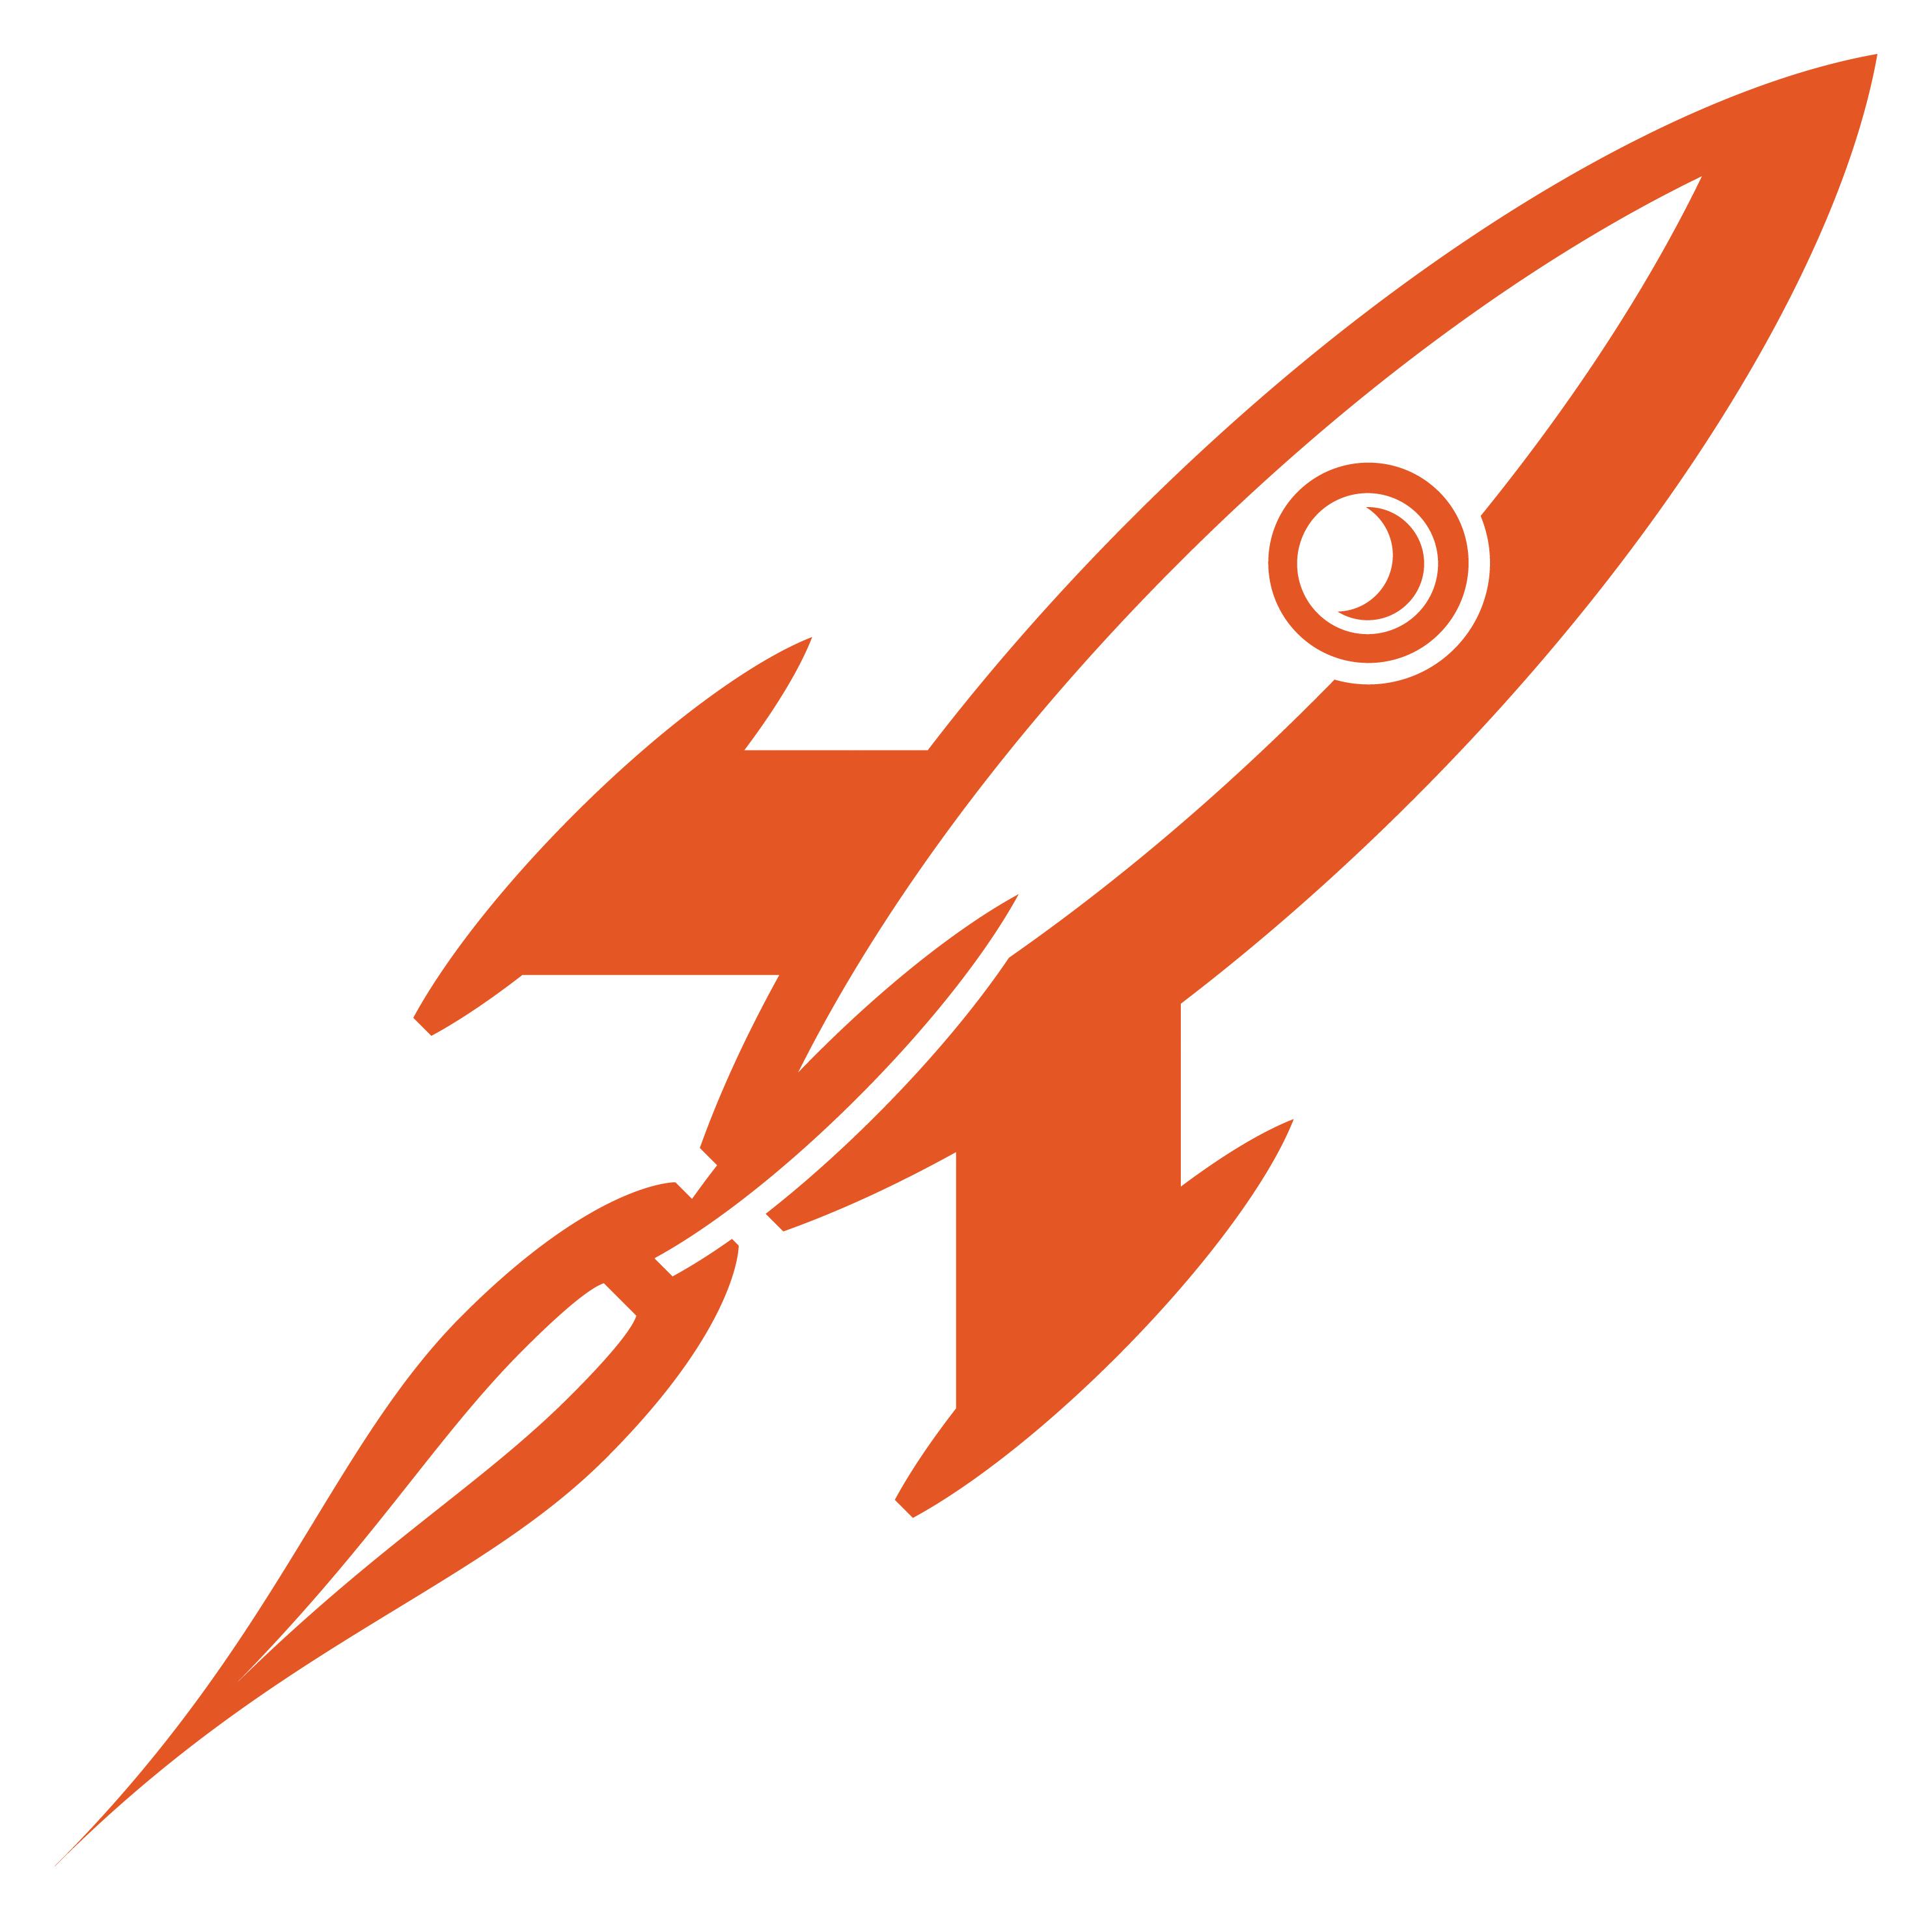 Rocket Launch Pad Clipart.